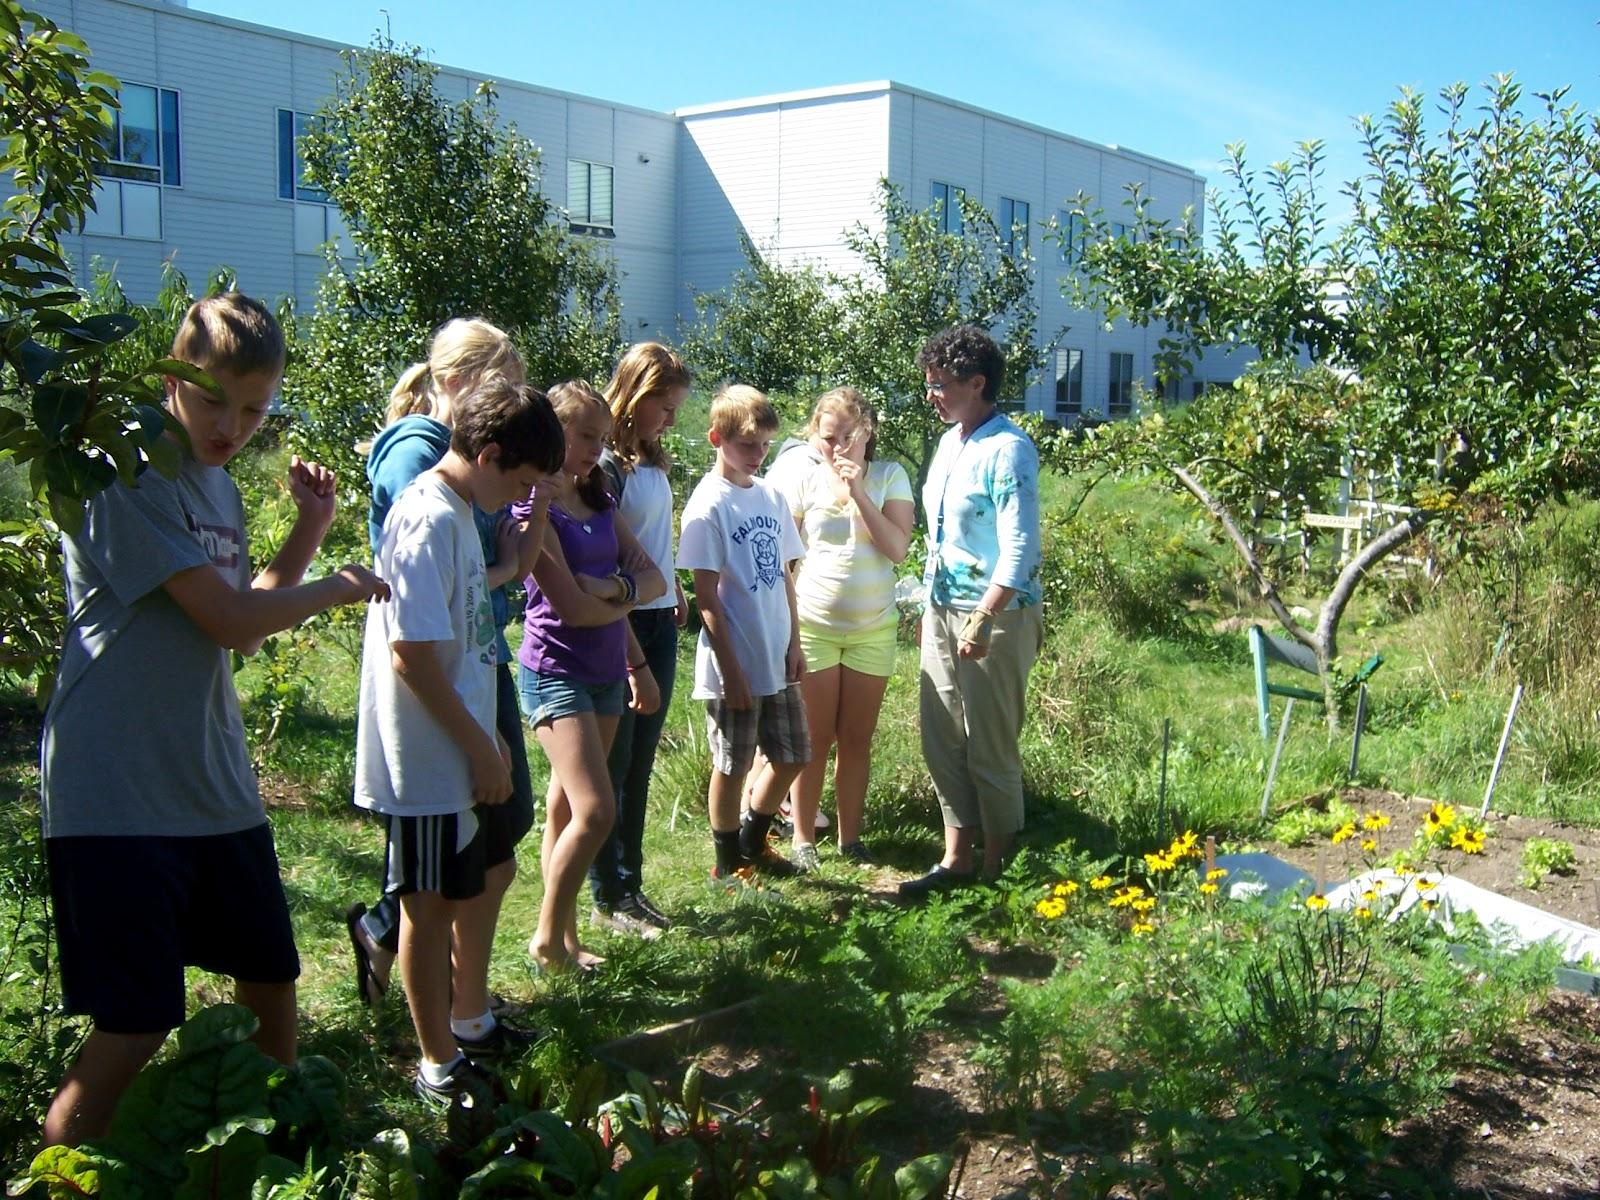 Fms Wellness Blog Farm 2 School Activity In Health Class